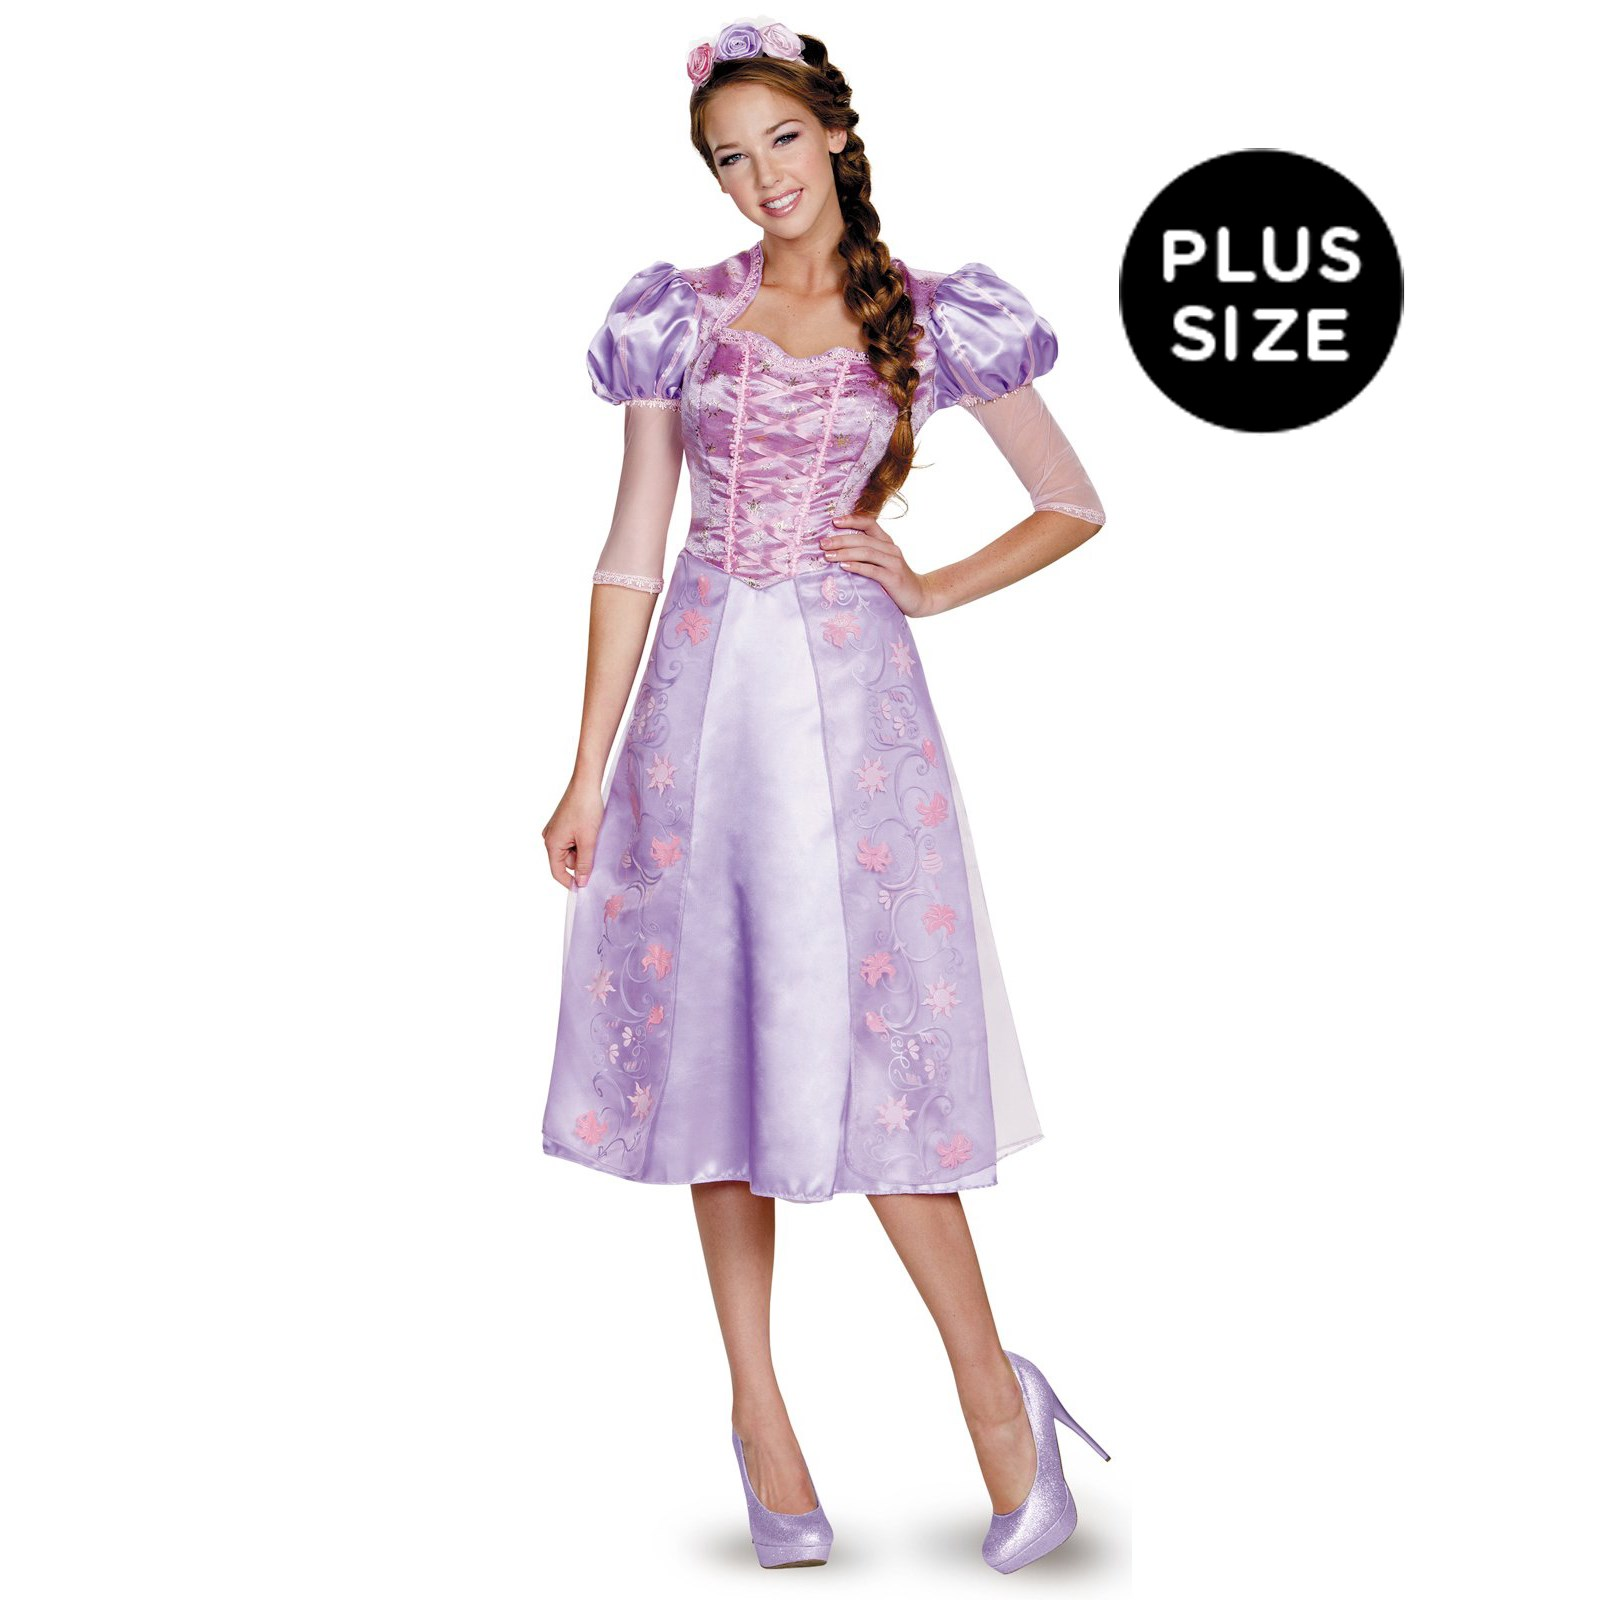 Disney princess gowns for adults - Disney Princess Deluxe Plus Size Rapunzel Costume For Women